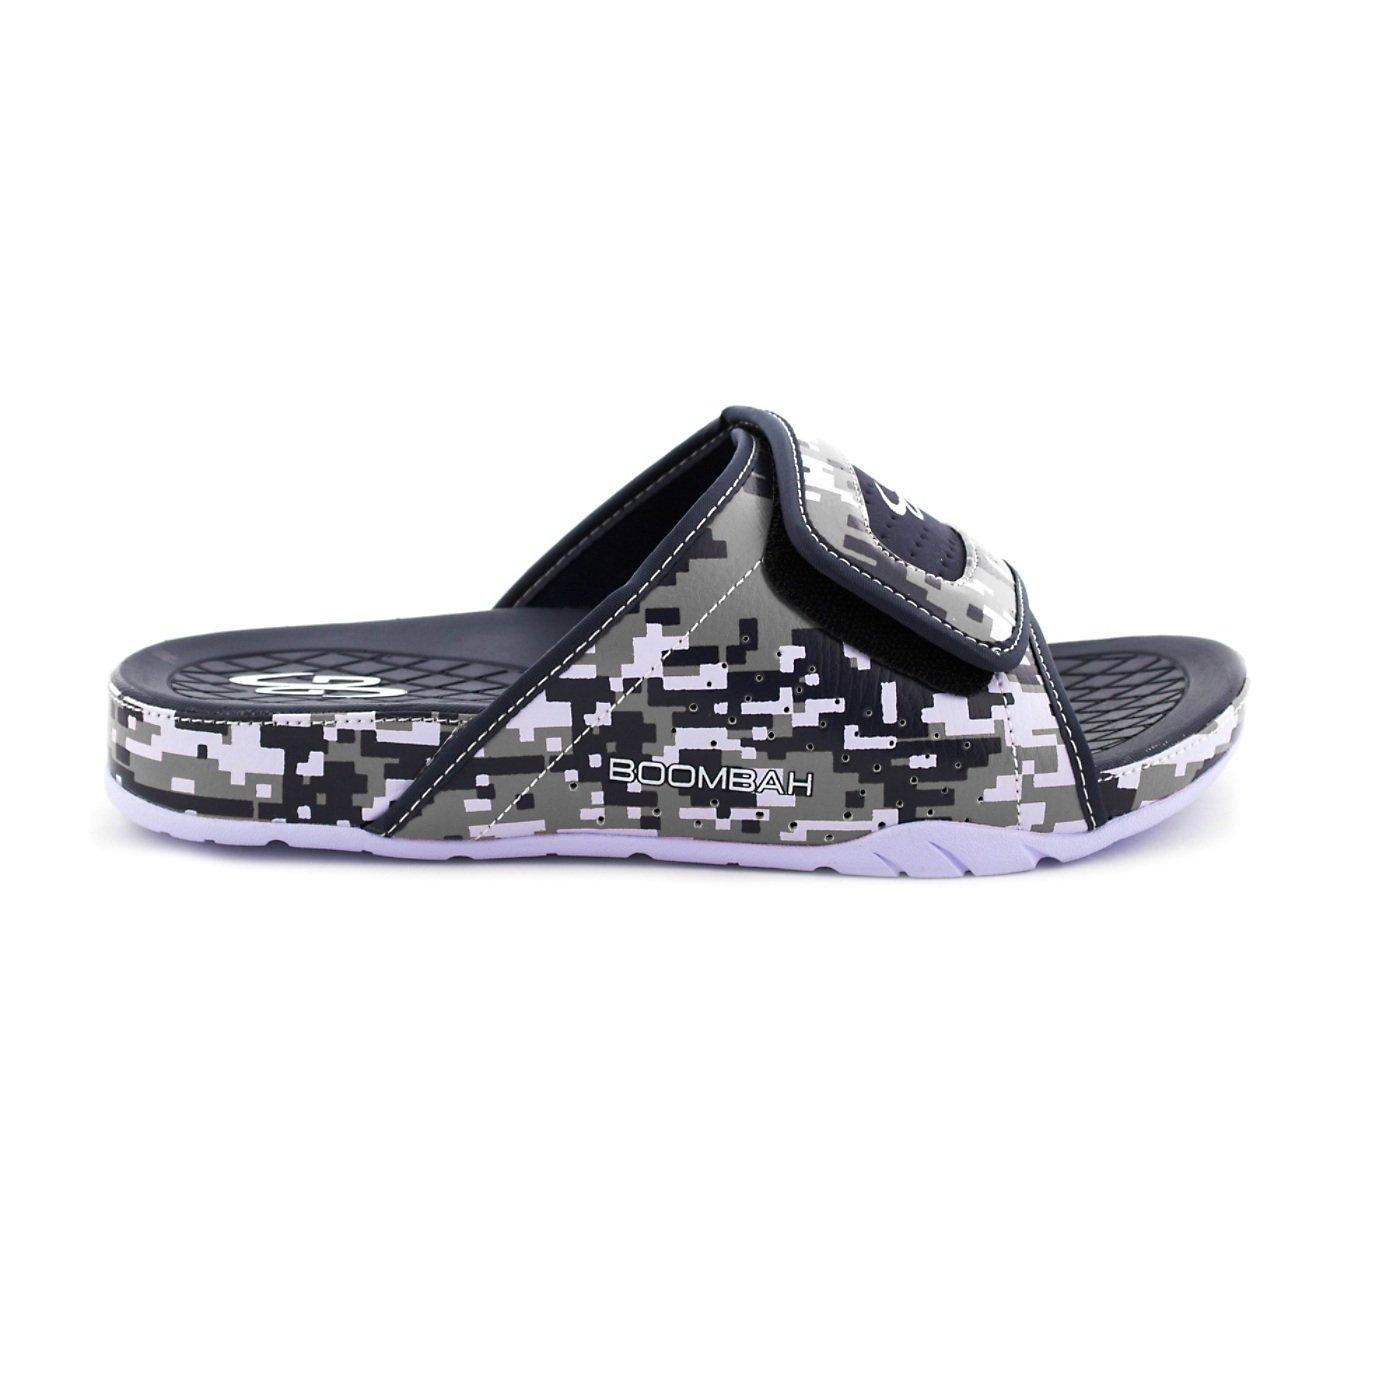 Boombah Men's Tyrant Digital Camo Slide Sandals - 11 Color Options - Multiple Sizes B077NM1LLR 12|Navy/Gray